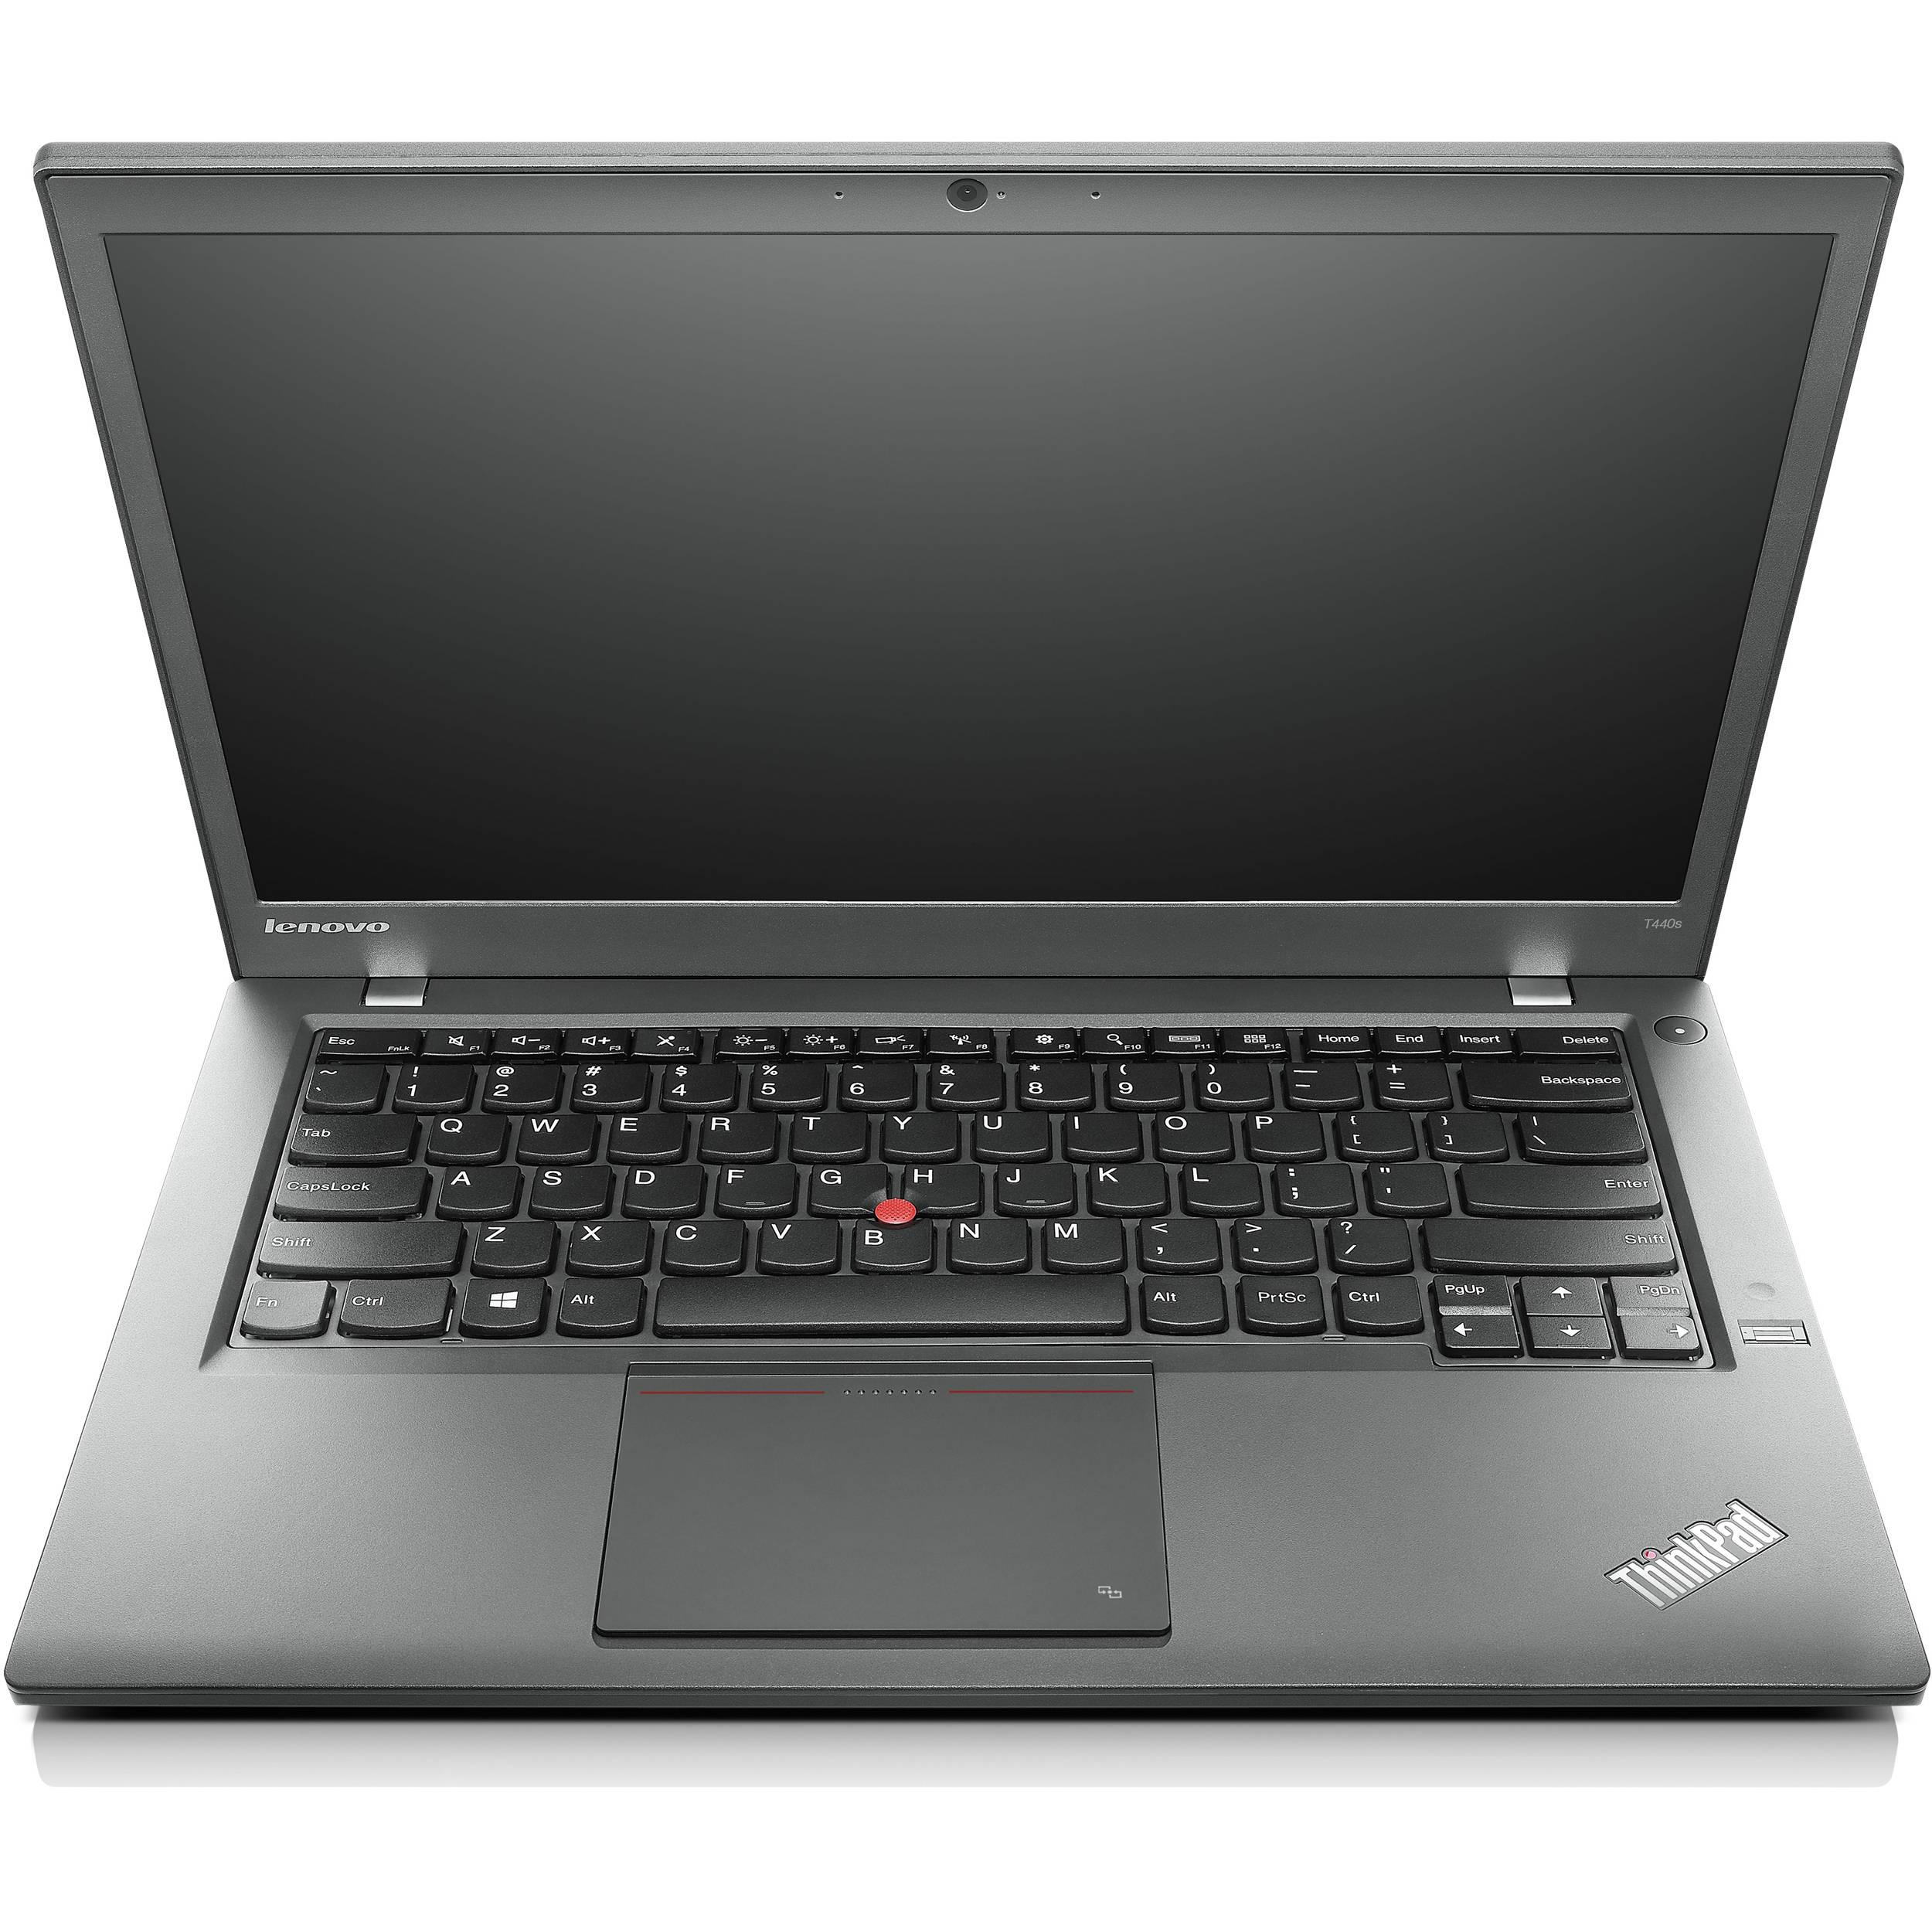 Laptop Thinkpad T440 Core i7 4300u Ram 8GB SSD 256GB 14inch xách tay giá rẻ